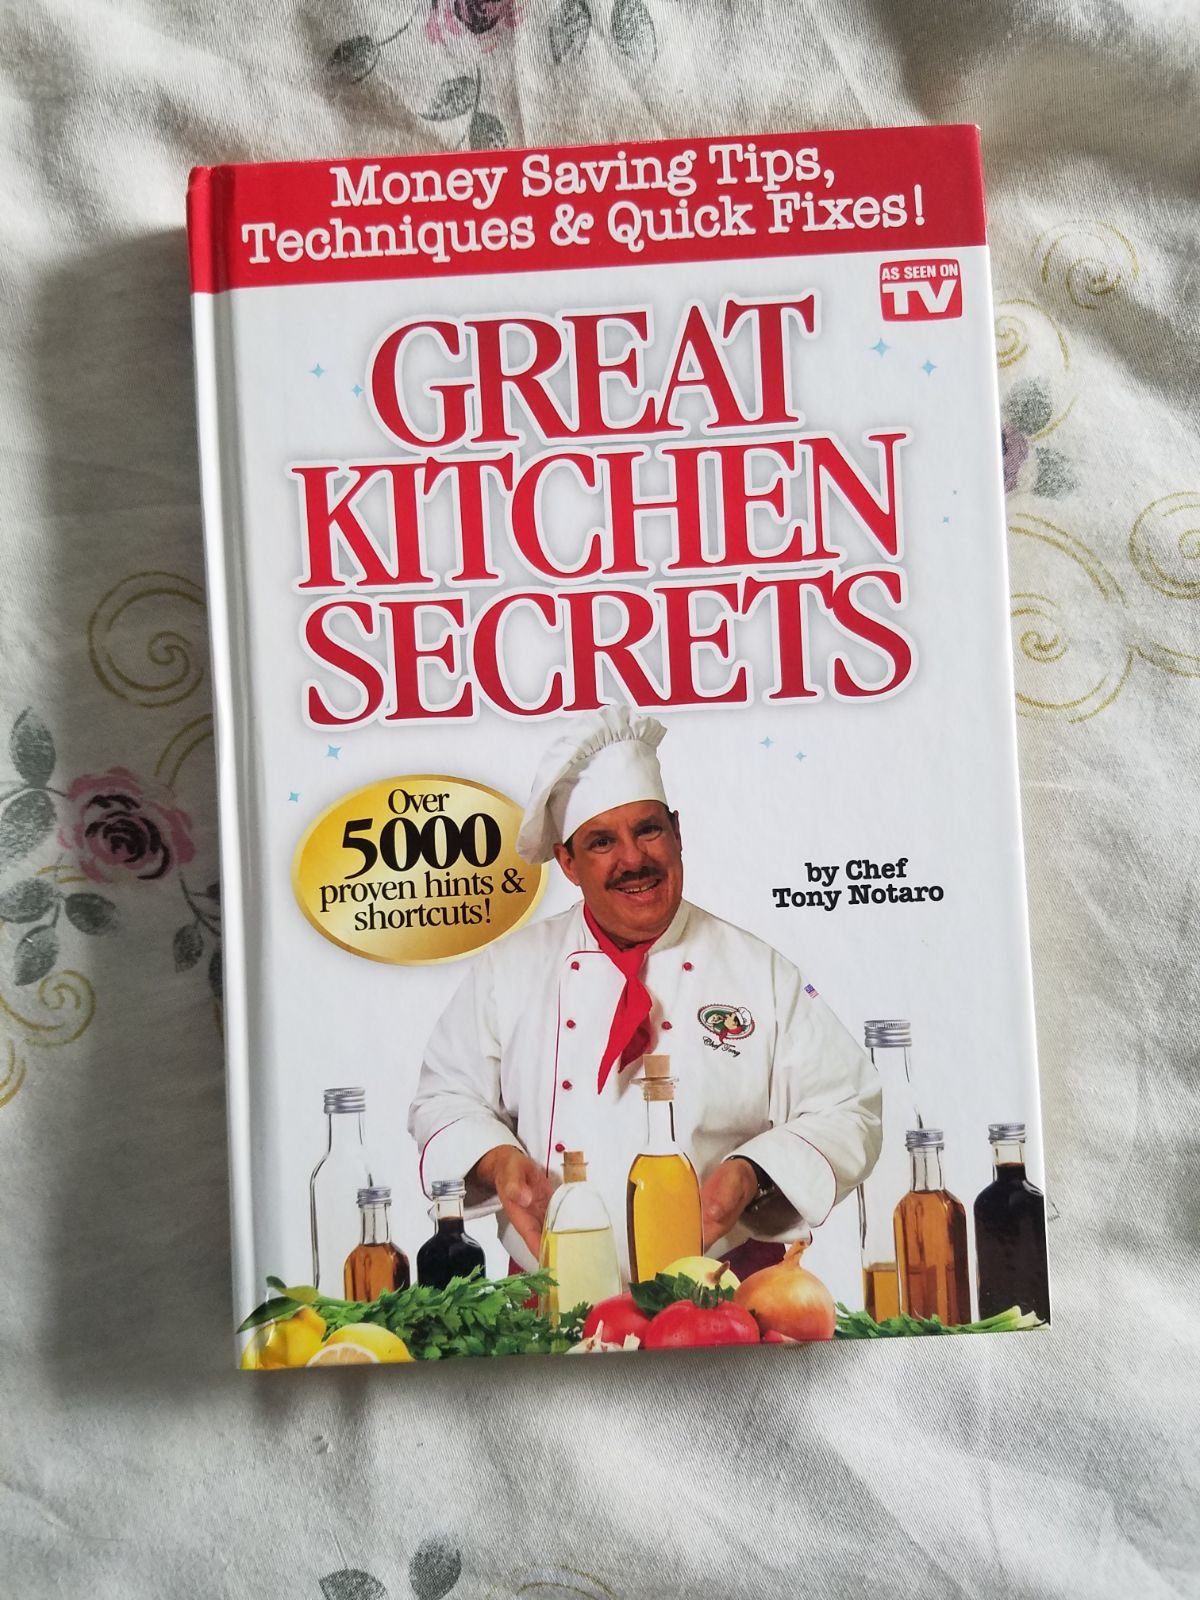 Great Kitchen Secrets book